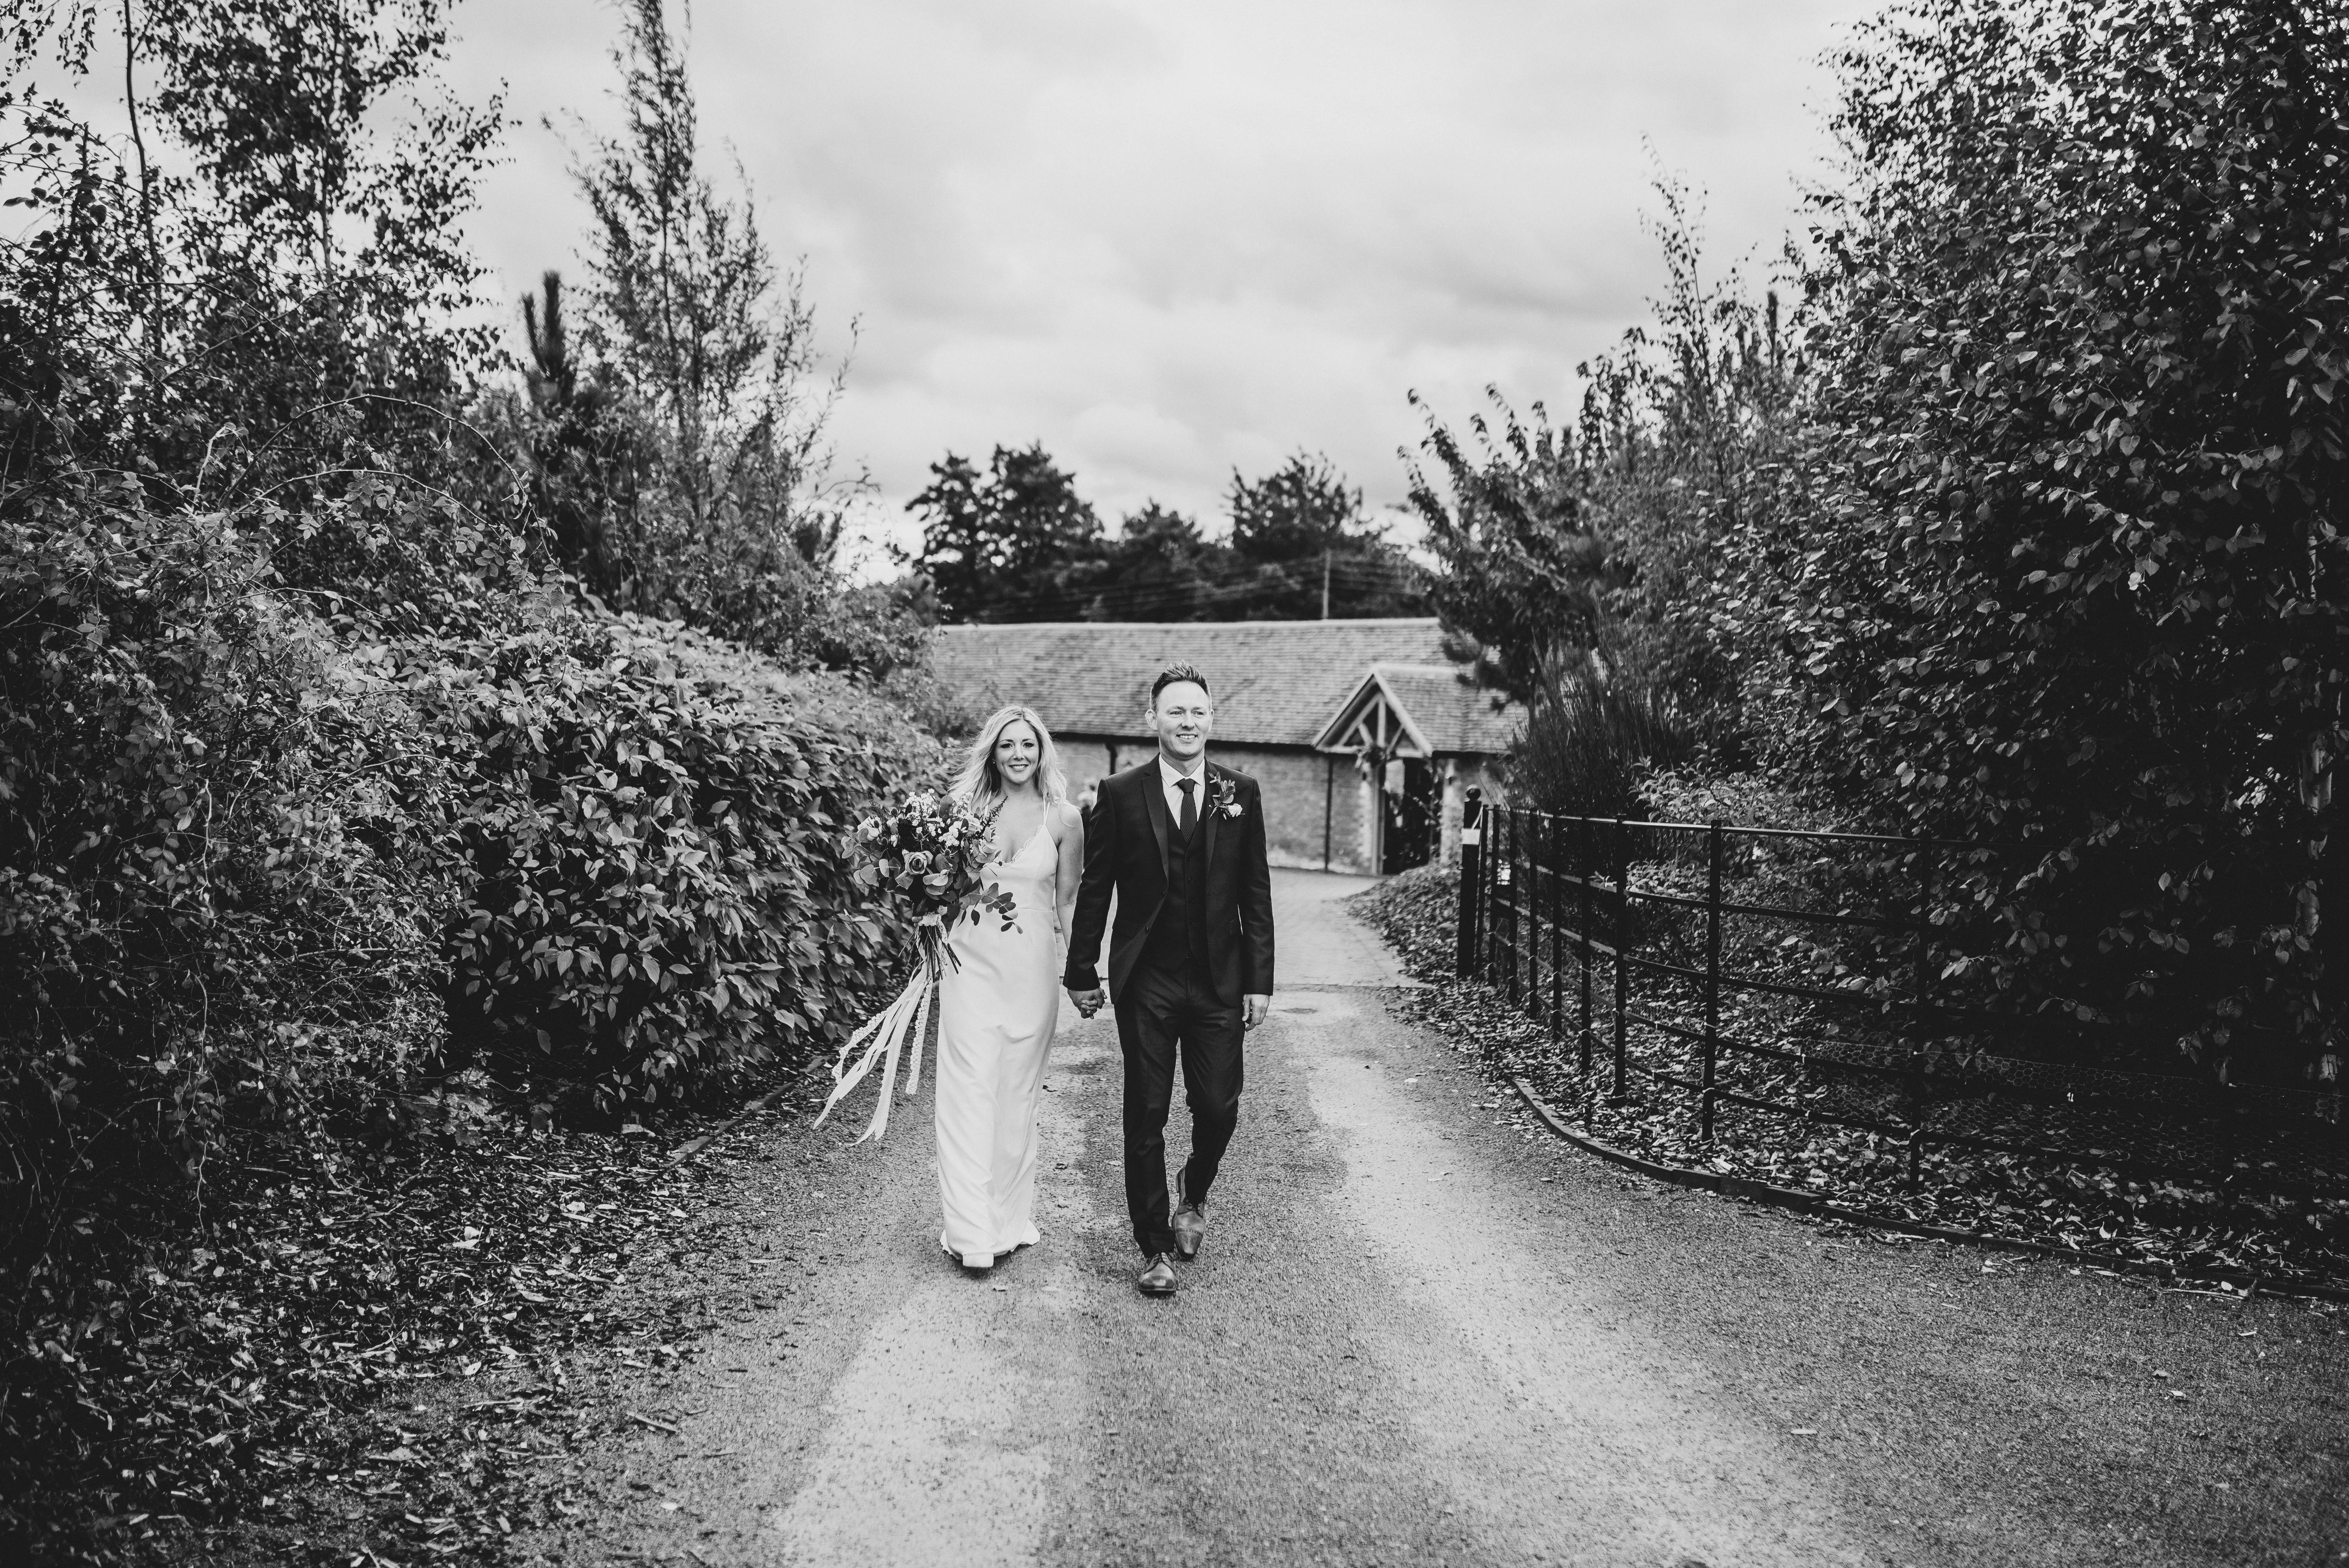 Real bride wearing Charlie Brear Stellan @cicilybridal